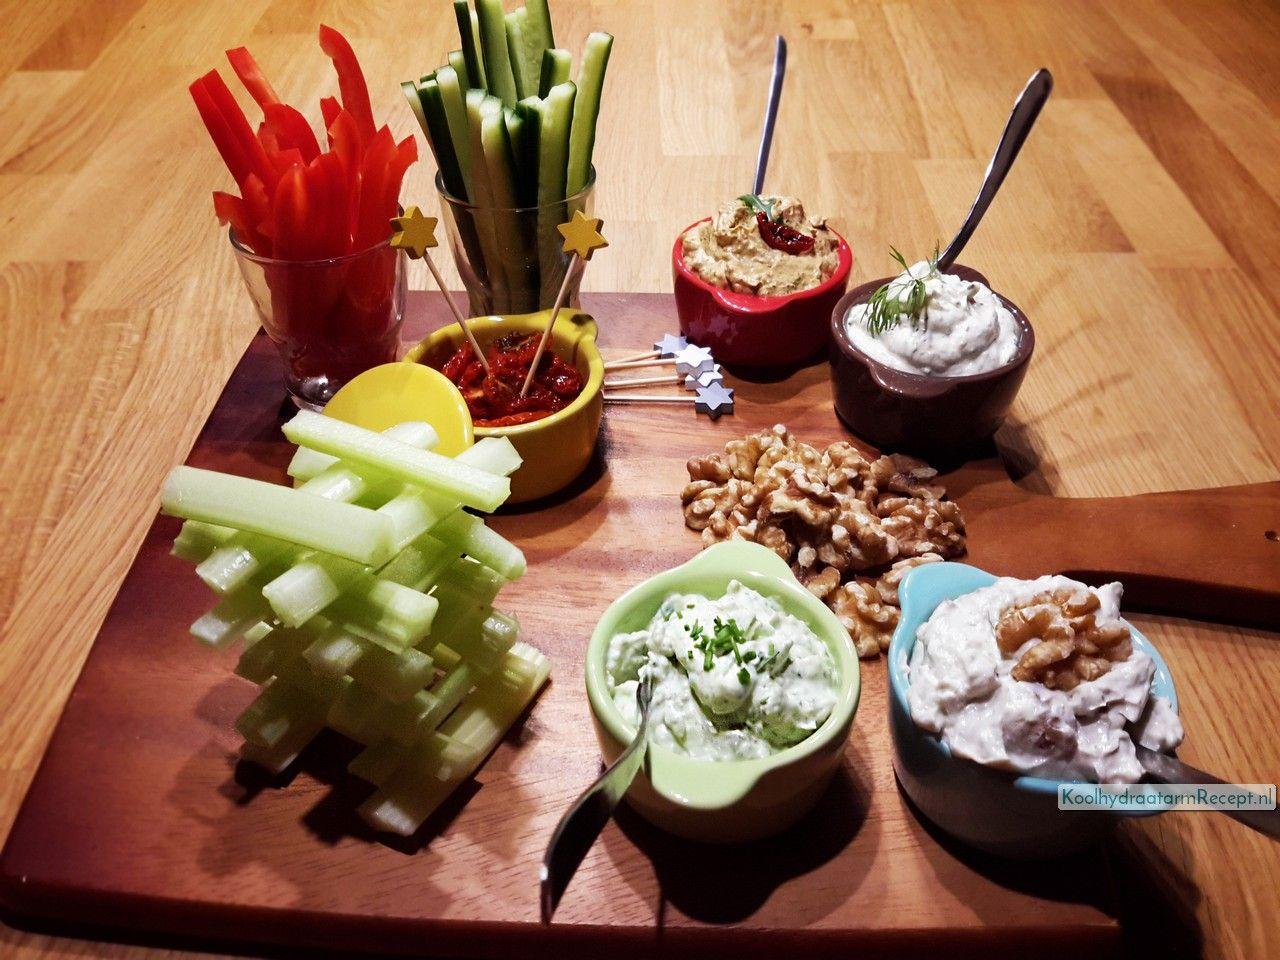 proteïnerijke snacks